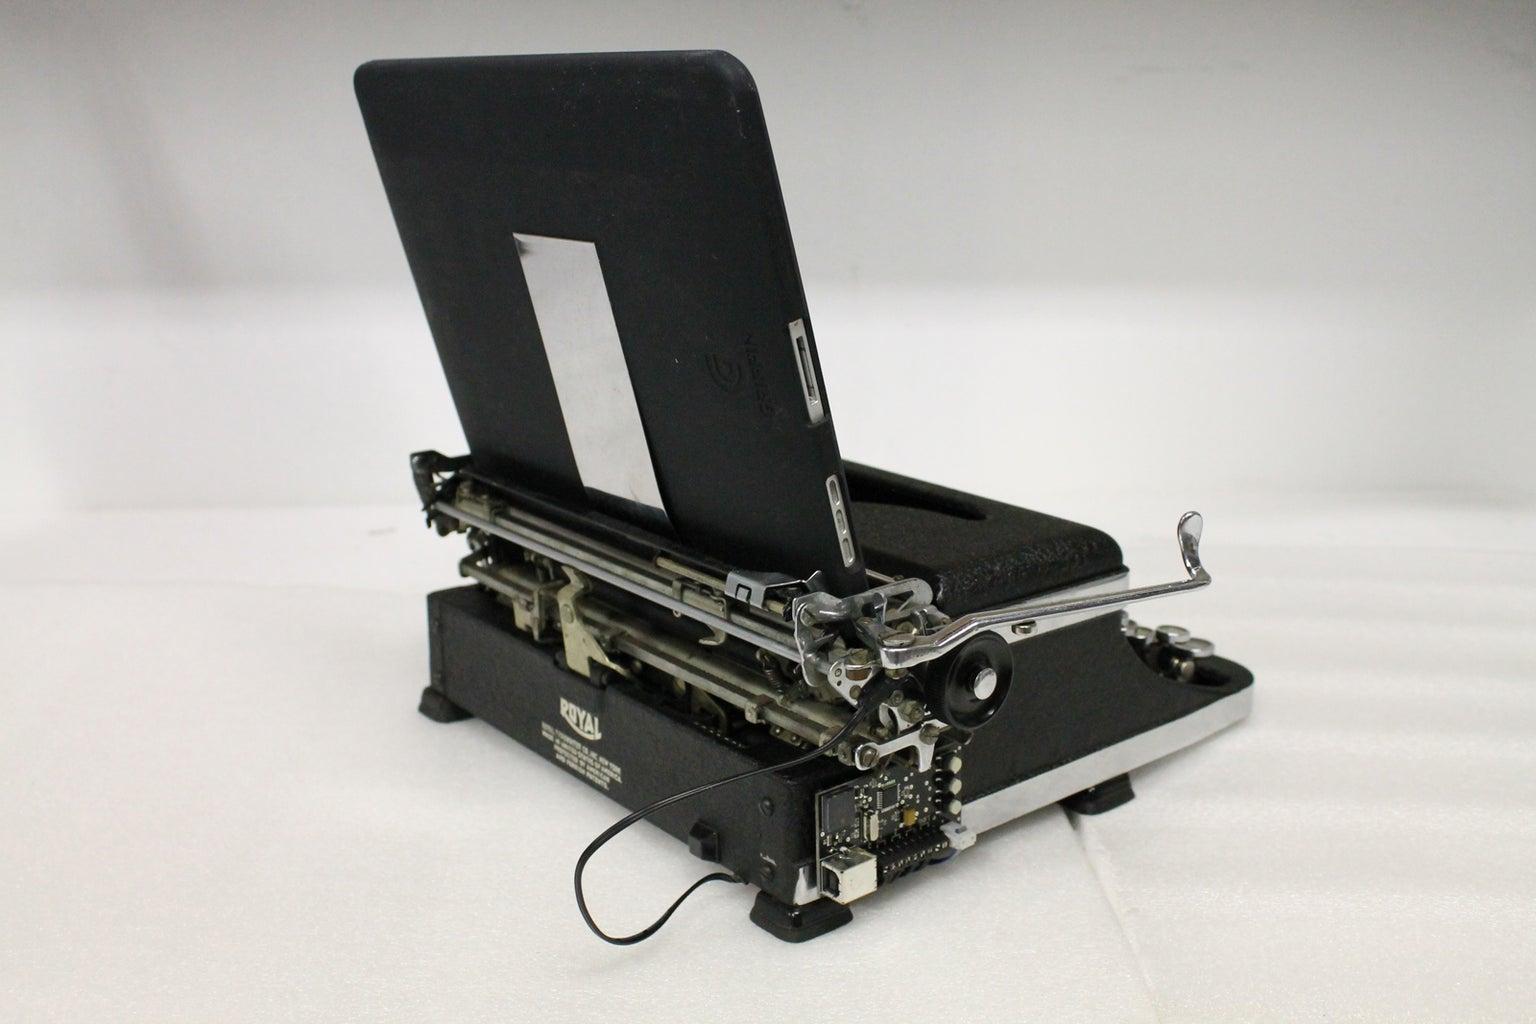 Place IPad on Typewriter